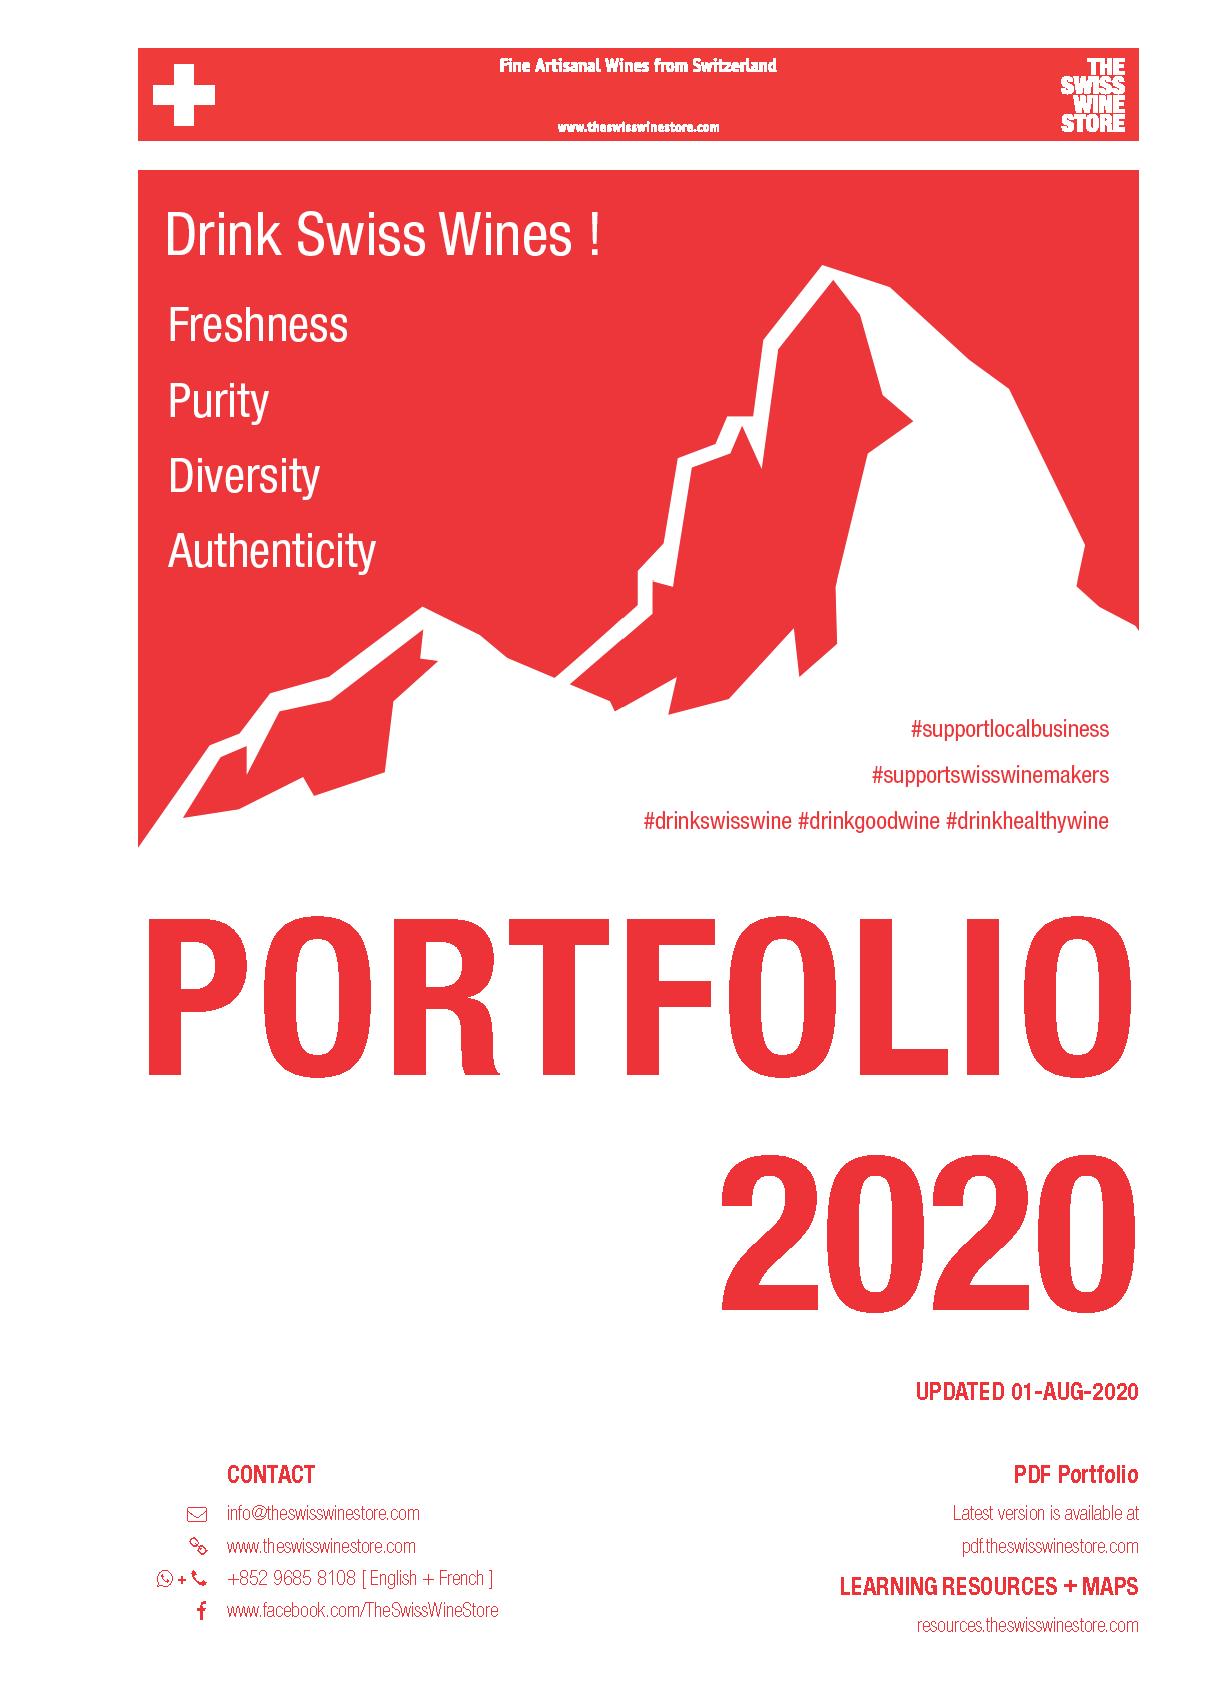 tsws_wine_portfolio_A4_2020-04.png